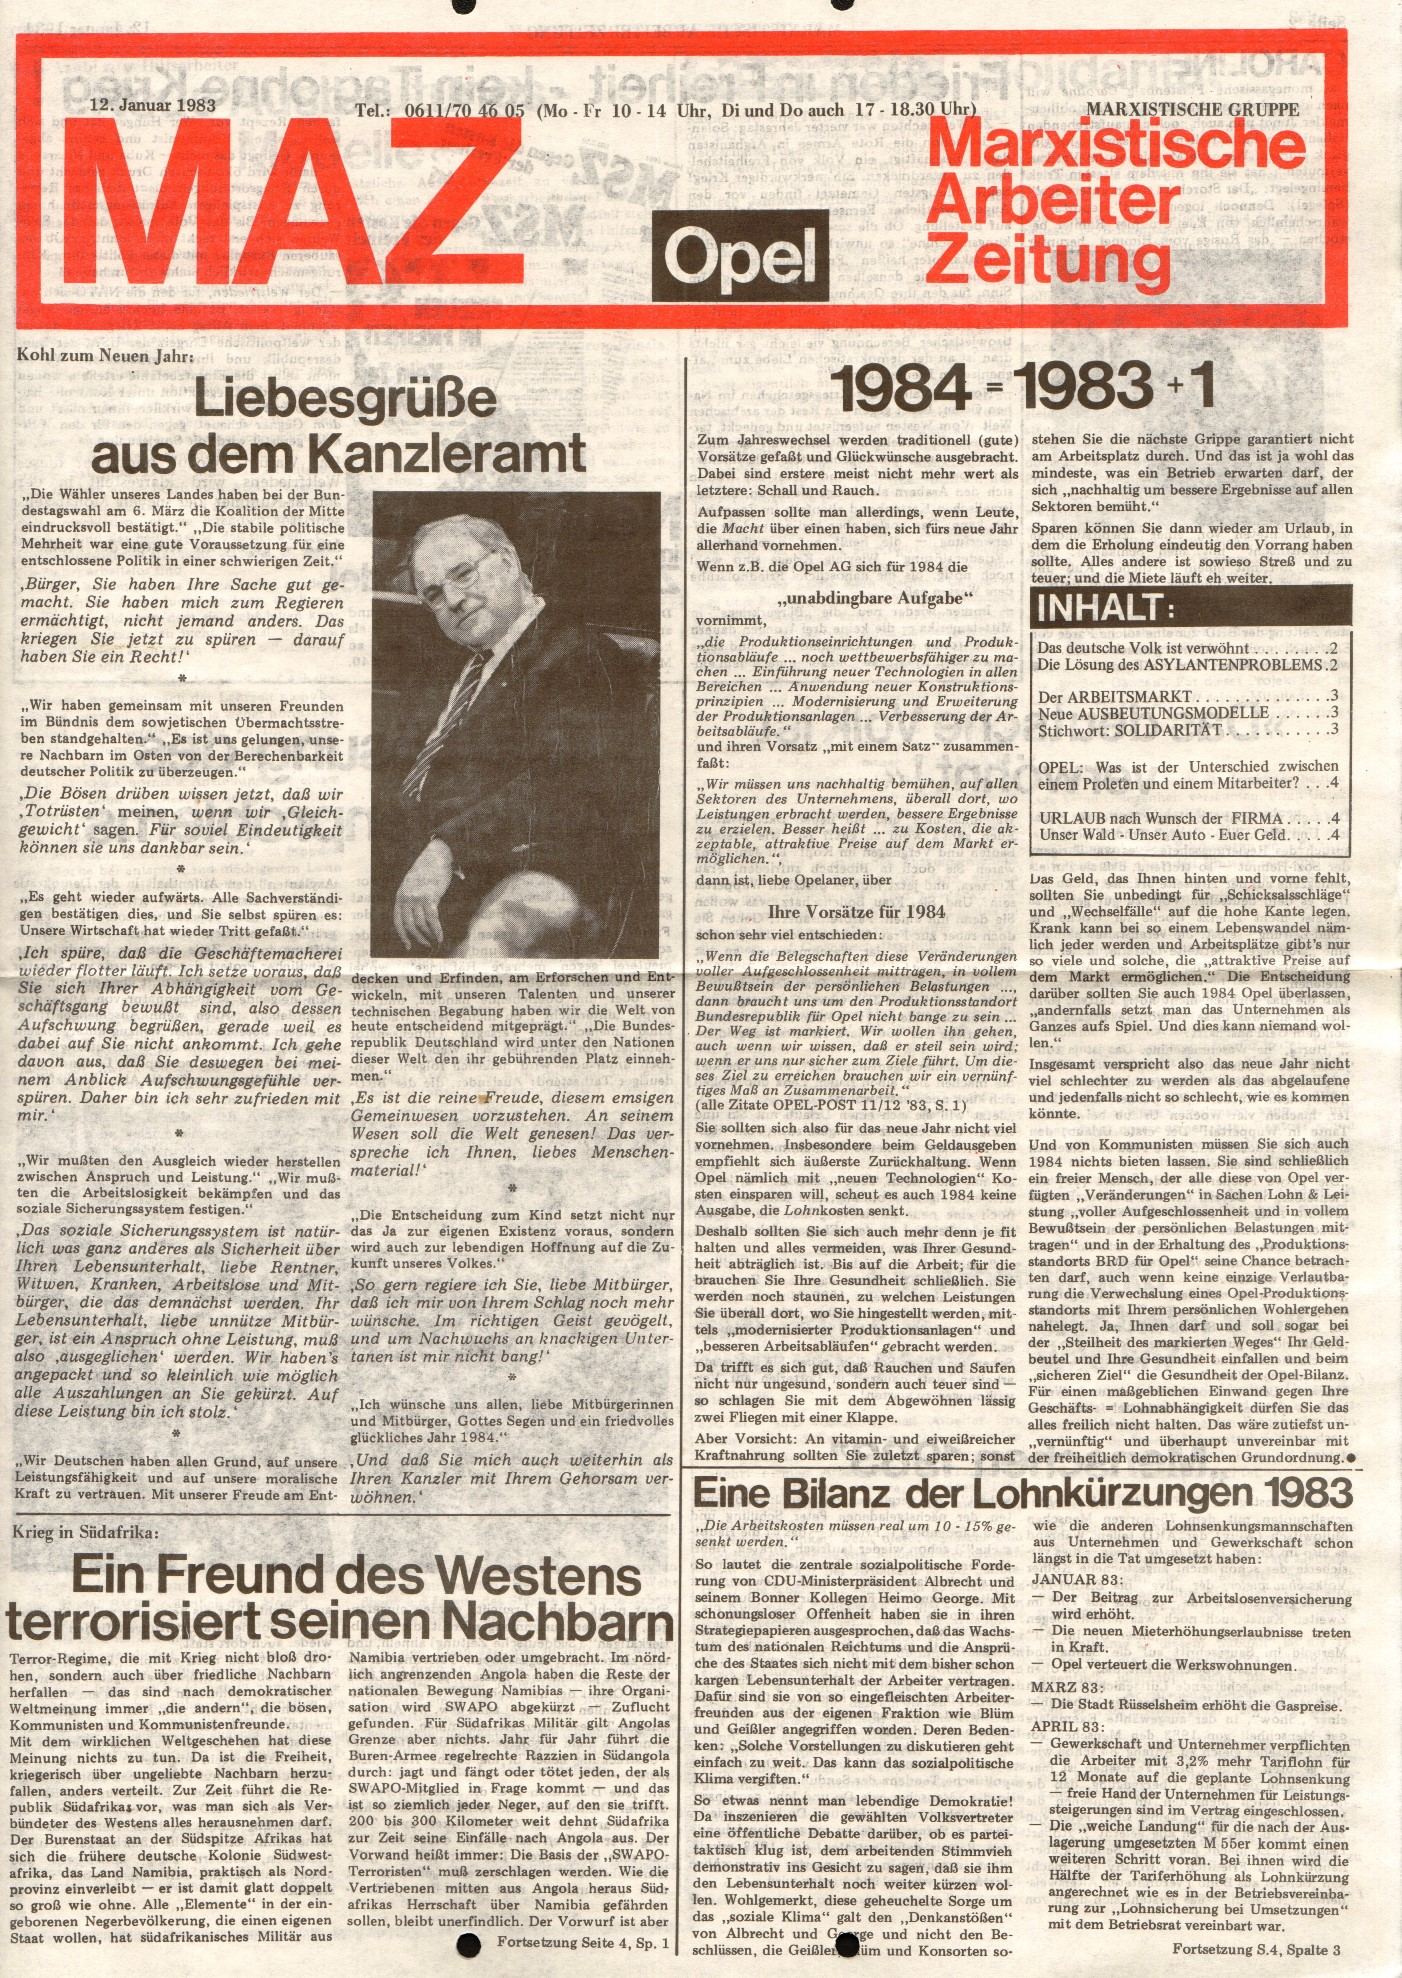 Ruesselsheim_MG_Marxistische_Arbeiterzeitung_Opel_19830112_01